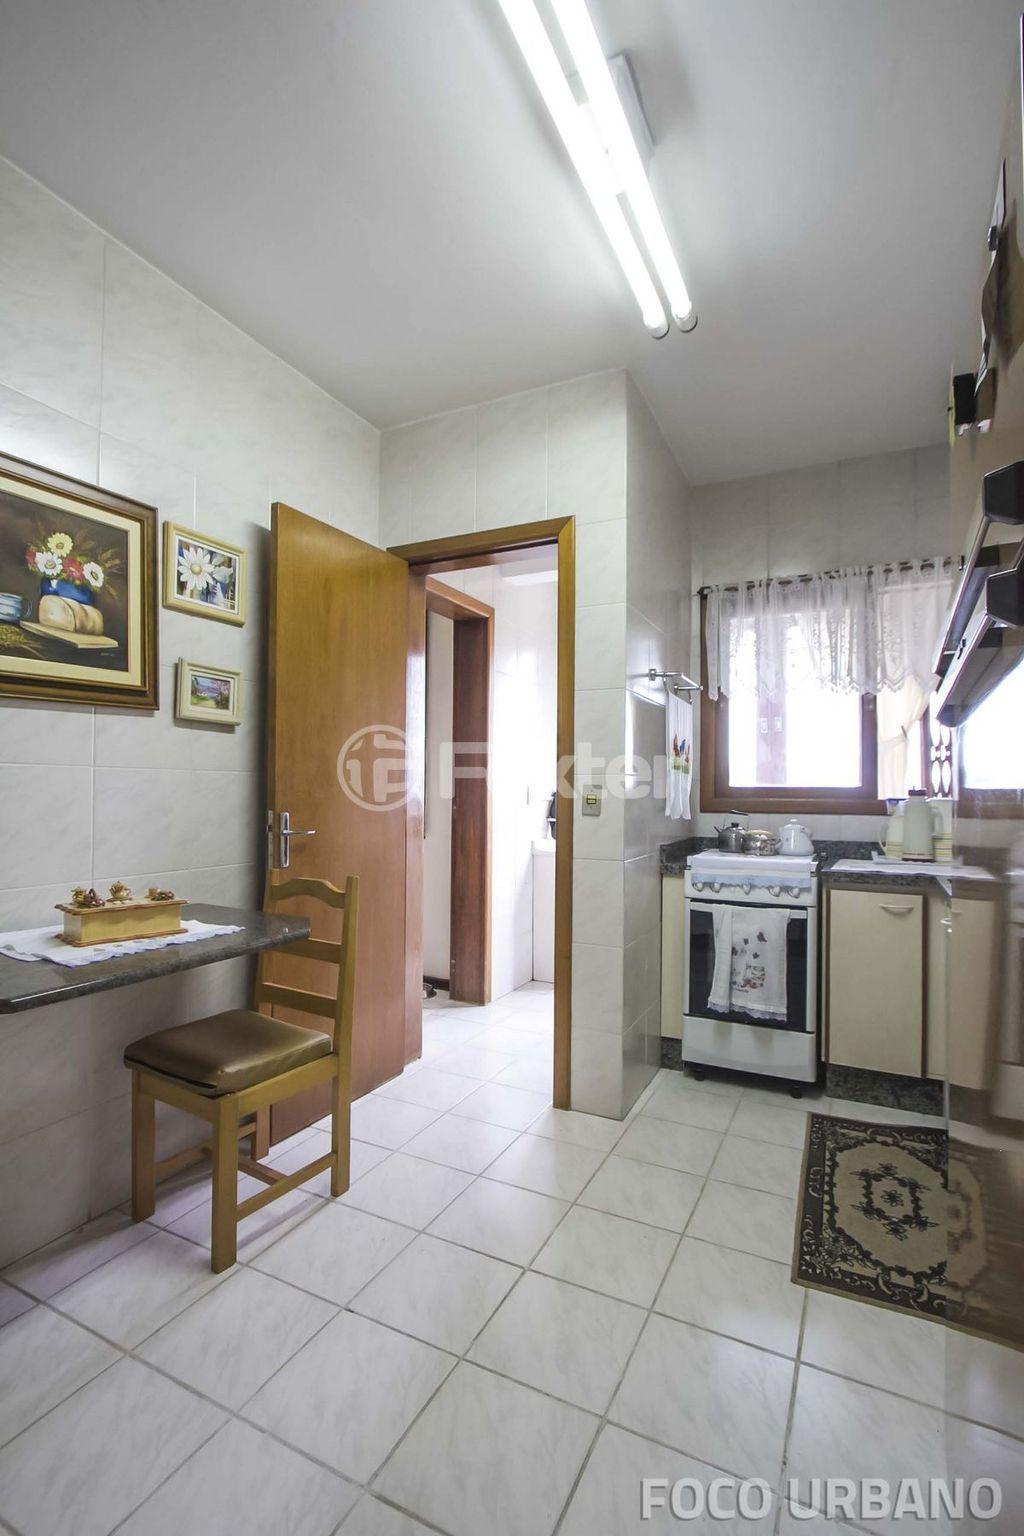 Cobertura 2 Dorm, Nonoai, Porto Alegre (138720) - Foto 22